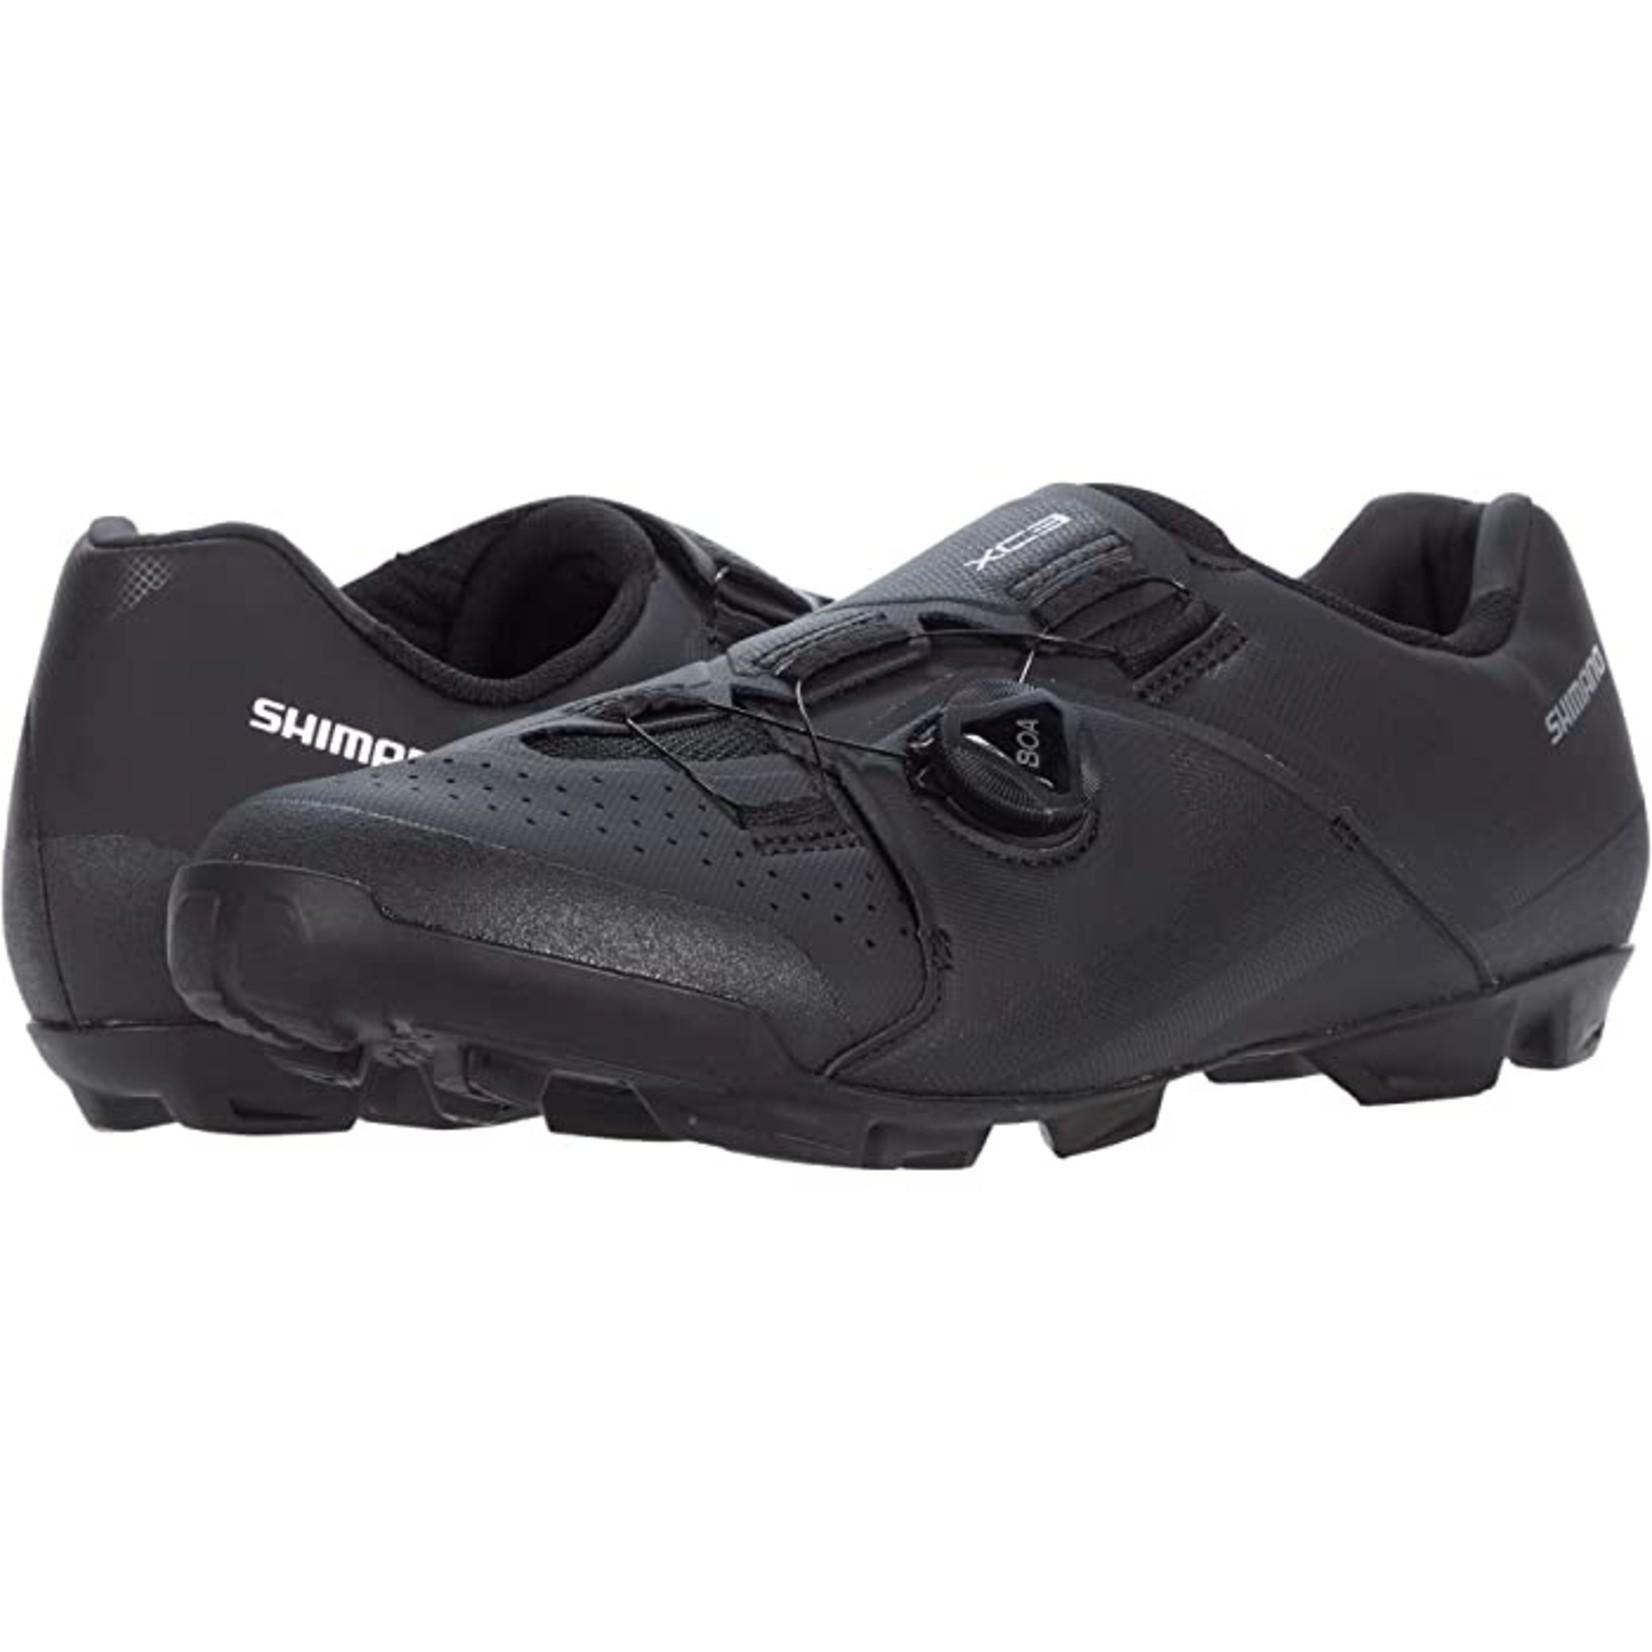 Shimano Shimano XC3 Mountain Shoe